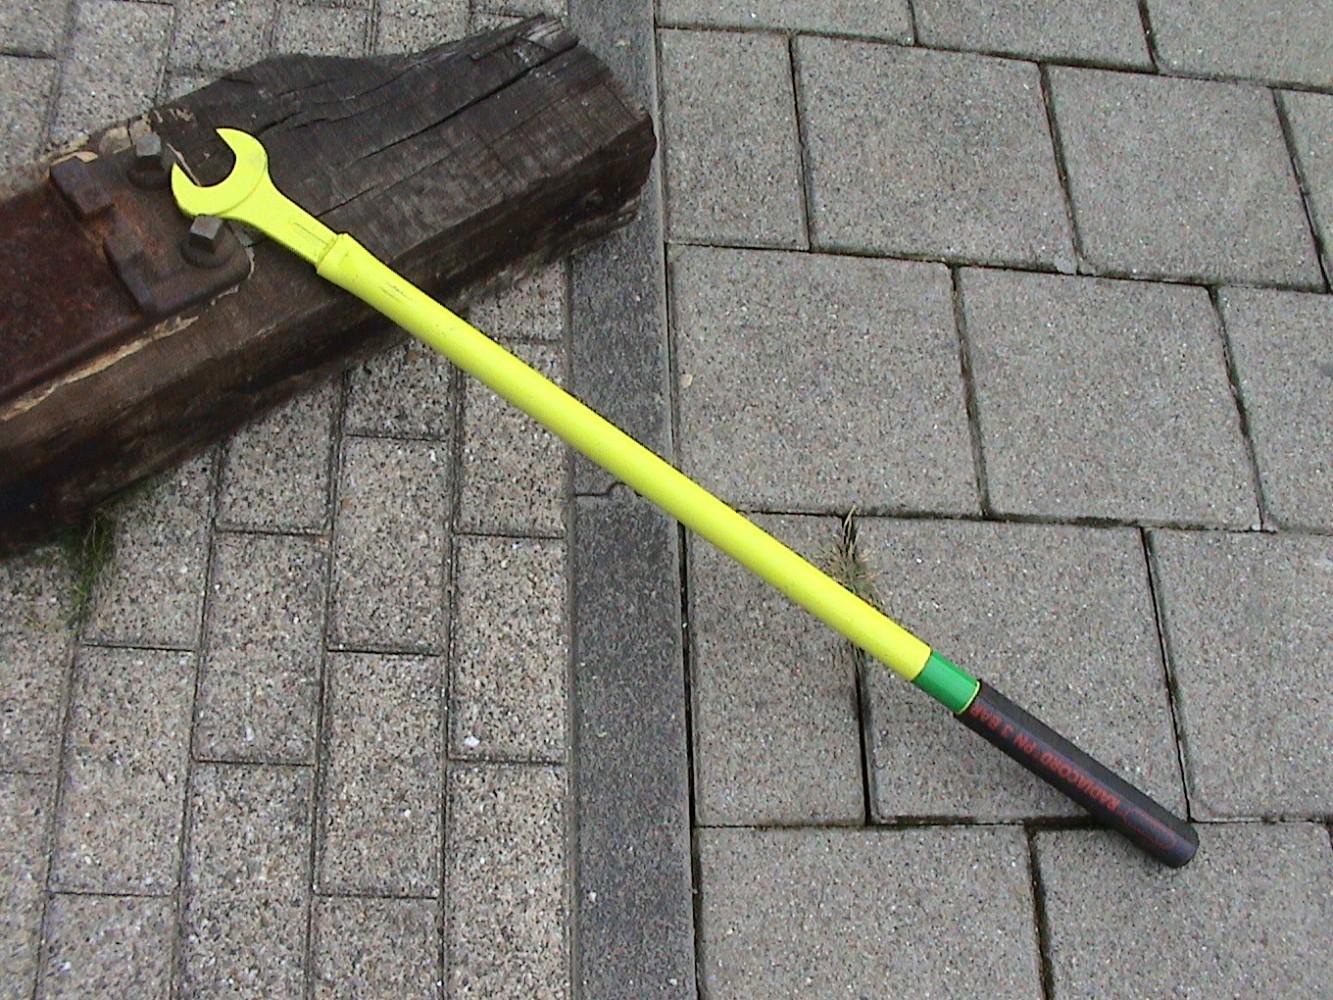 Lasboutsleutel 41mm lgt 90cm